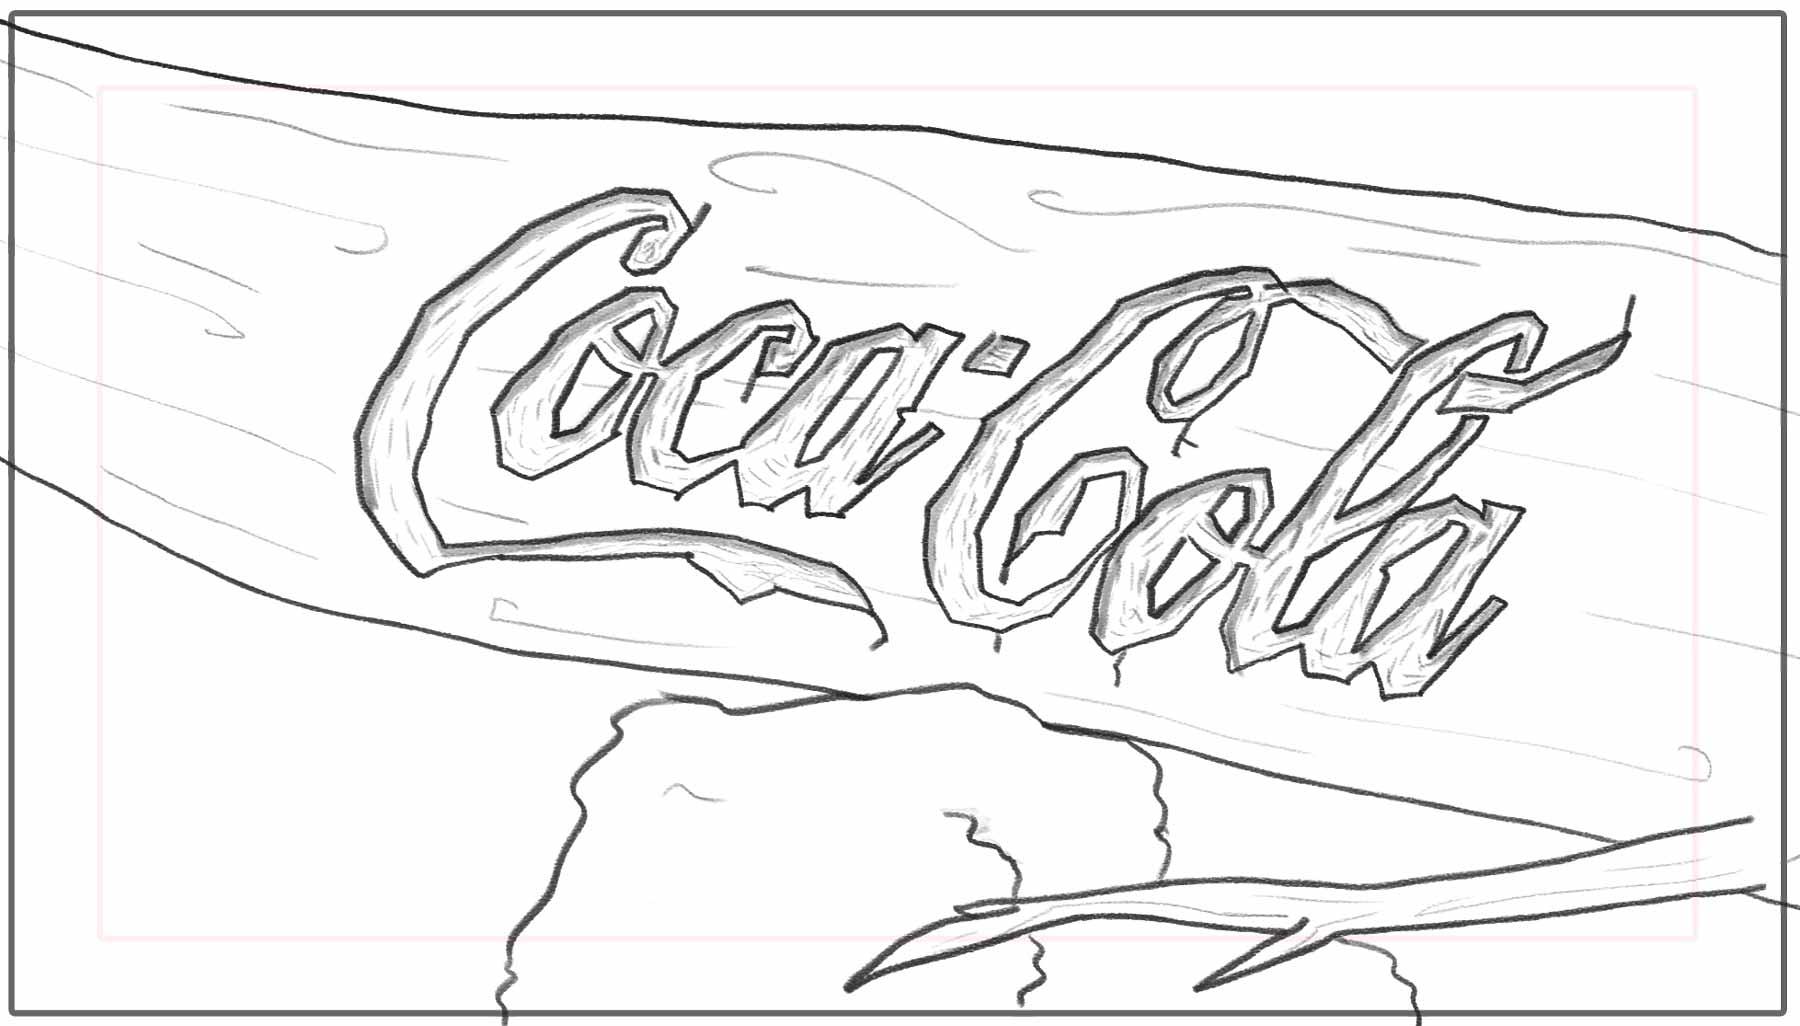 Make Believe — Storyboard frame — Coca Cola test type